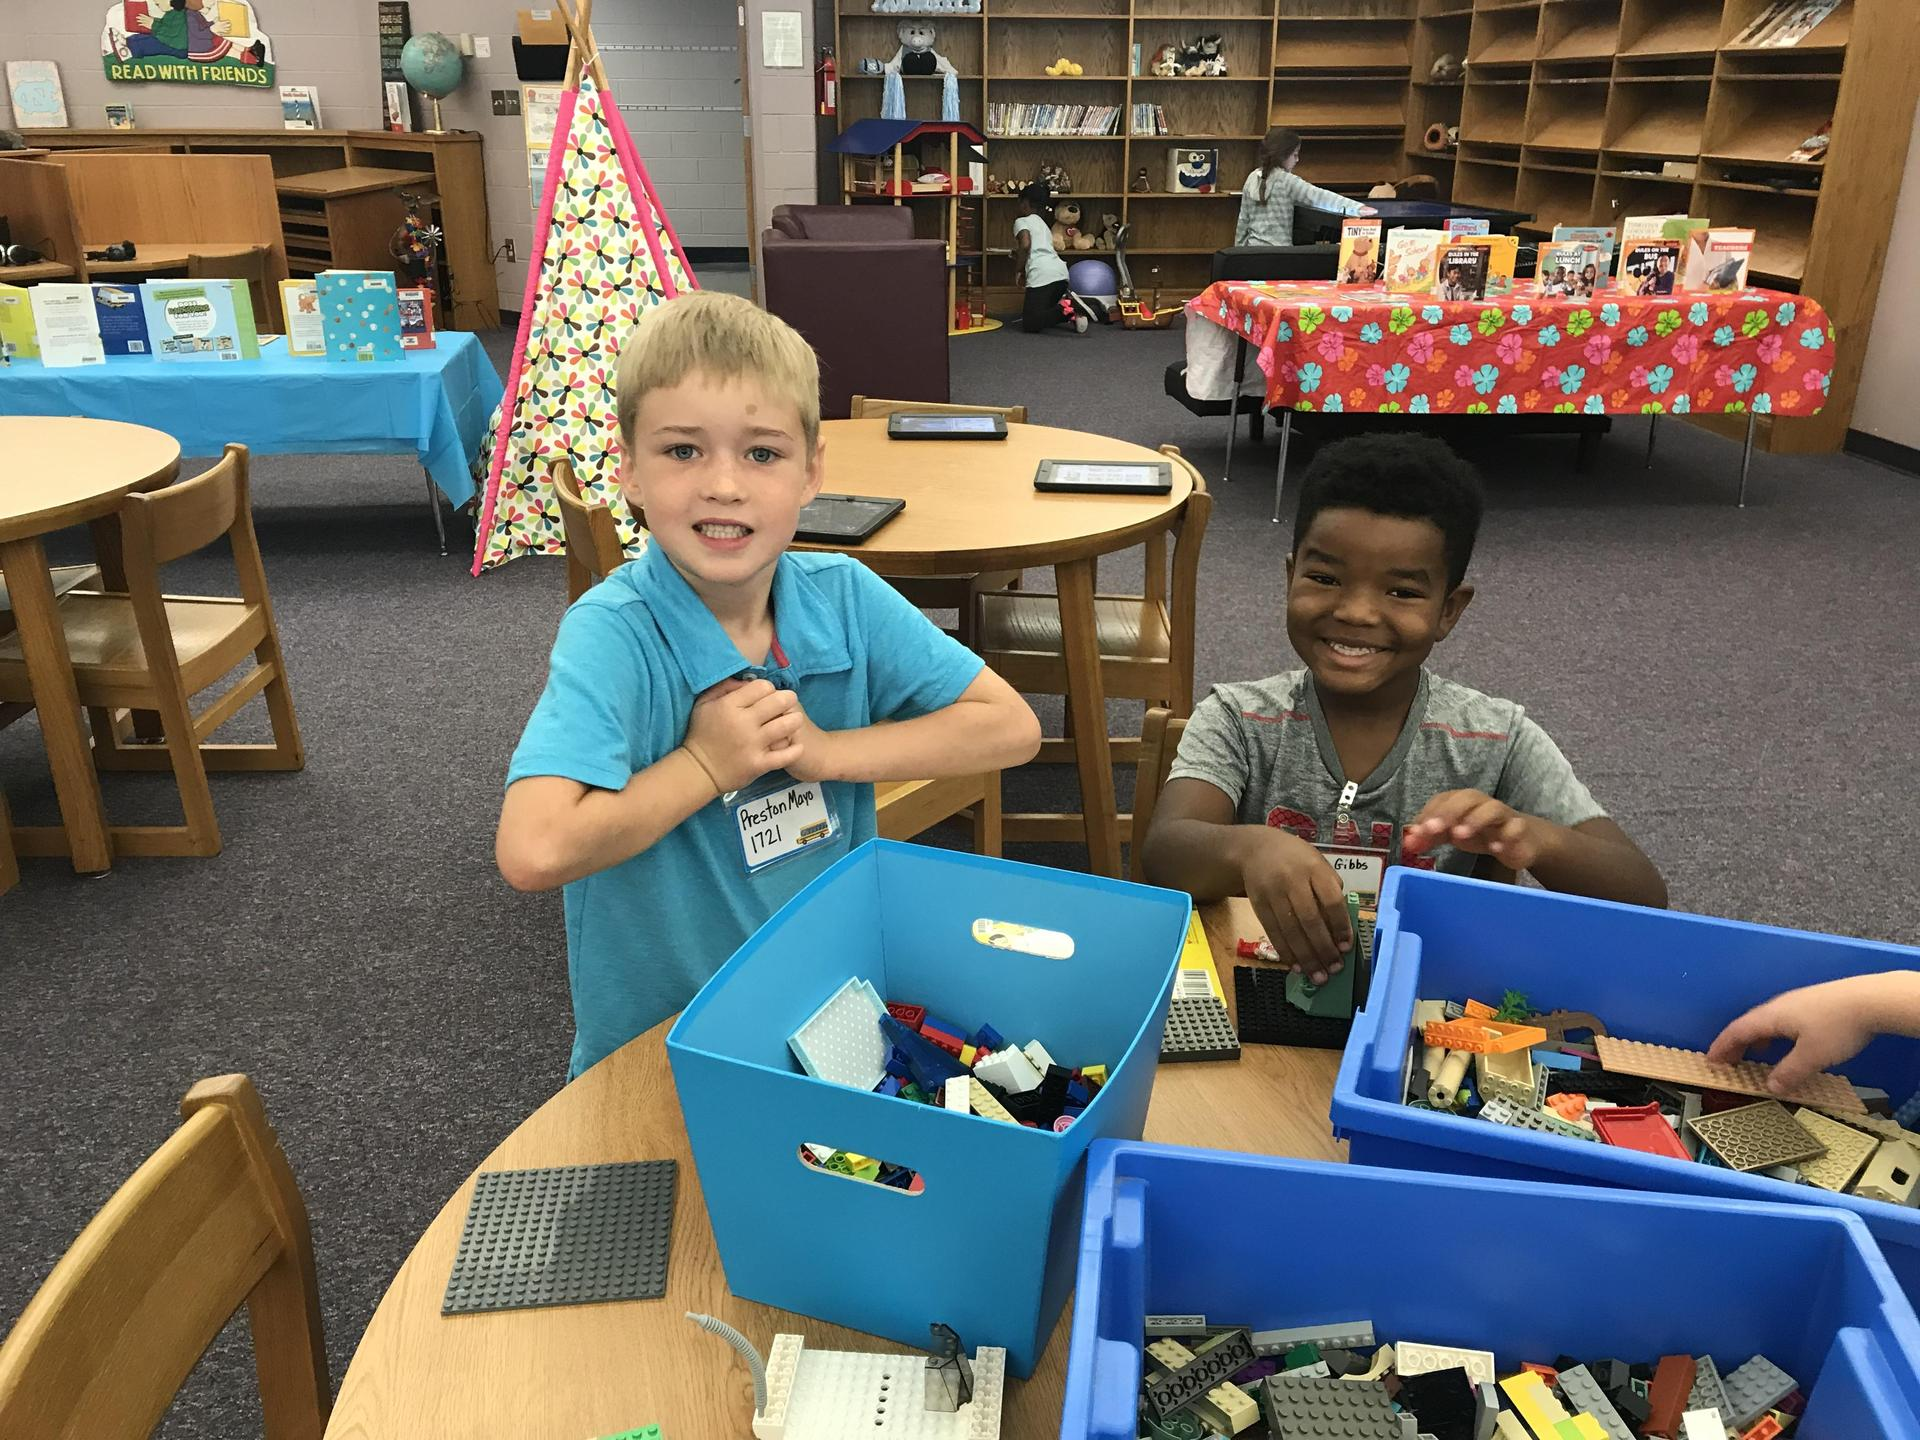 Boys playing legos